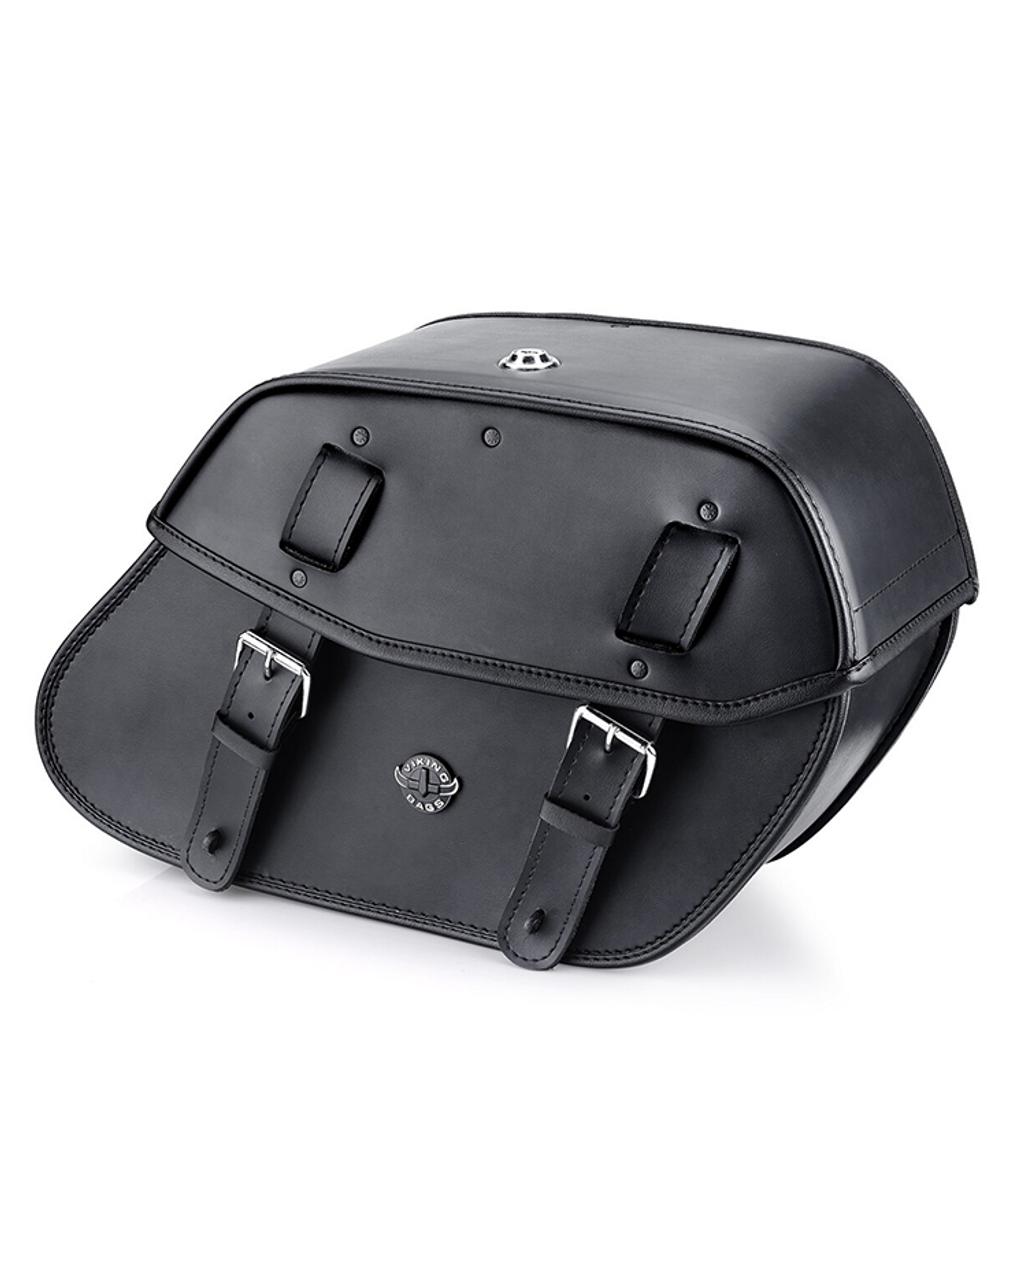 Viking Odin Large Motorcycle Saddlebags For Harley Softail Springer FXSTS Main Bag View